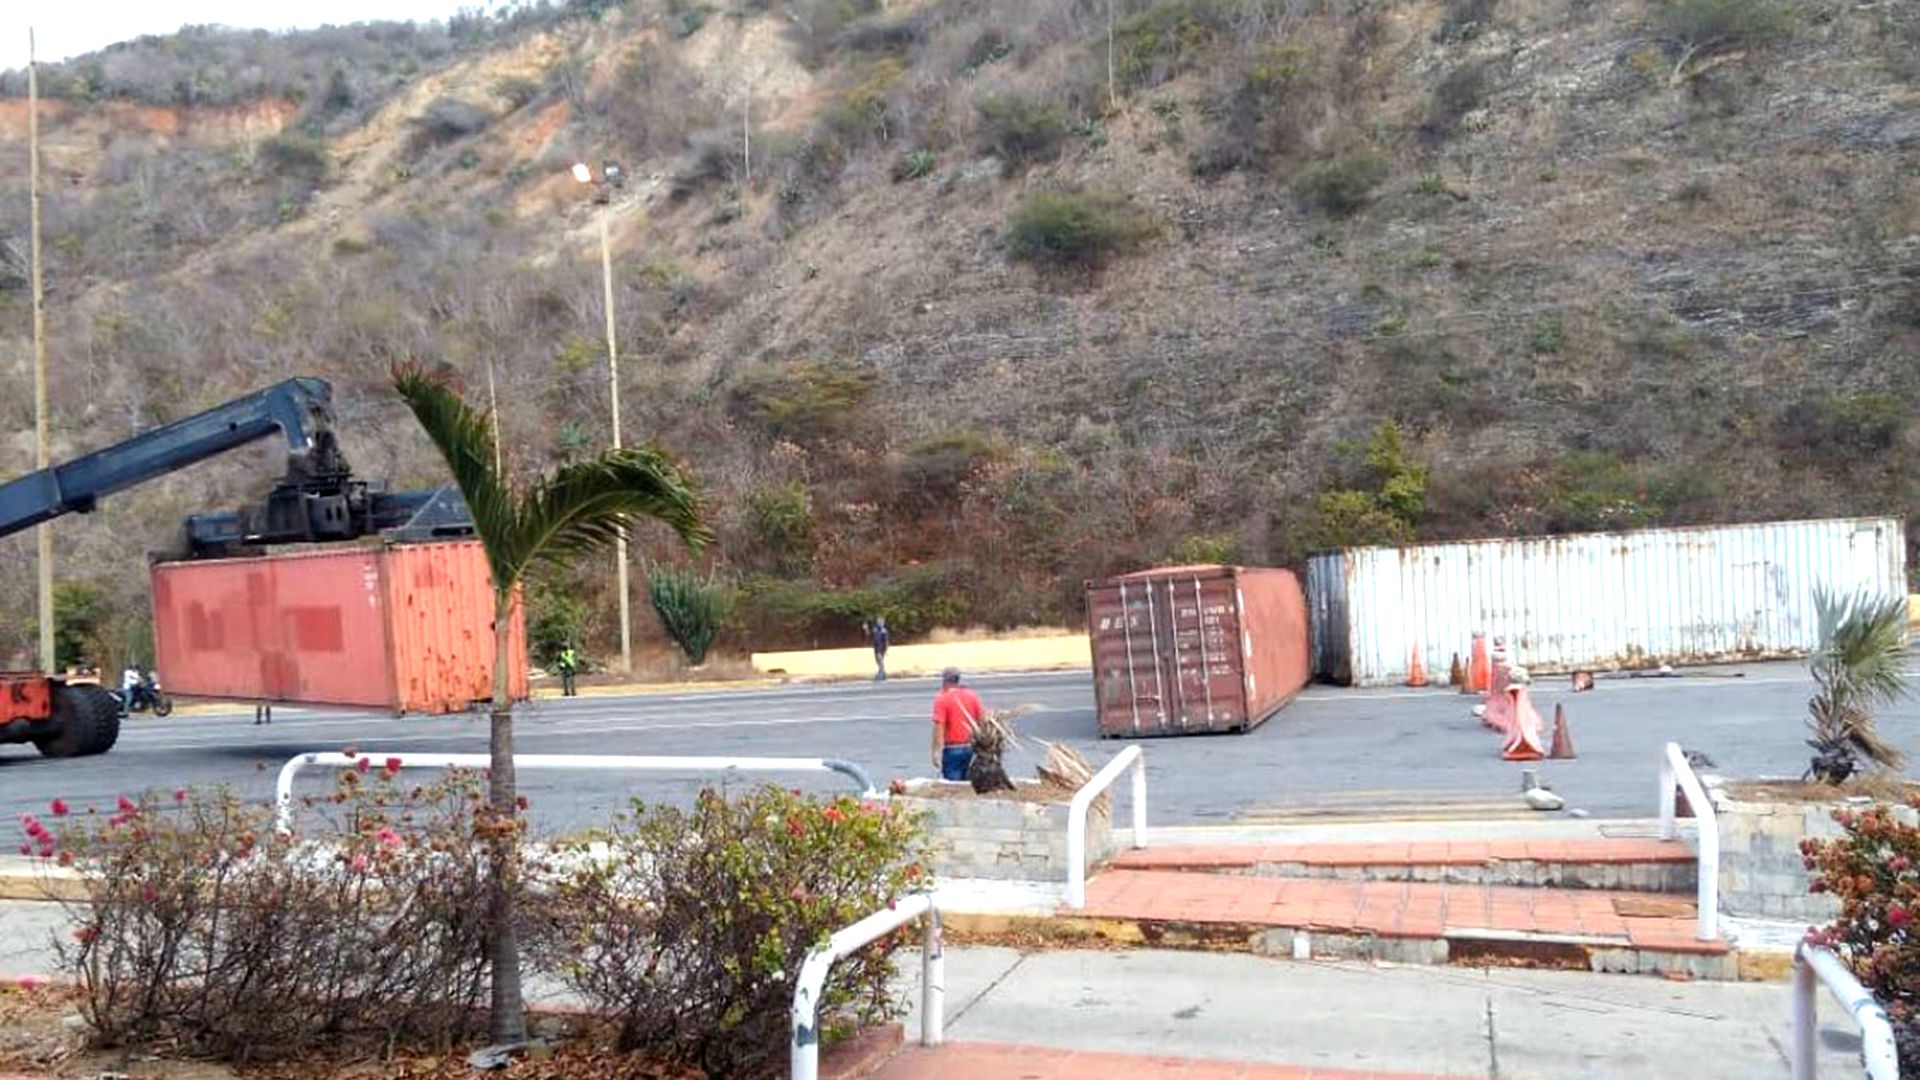 El régimen instaló contenedores de carga en la autopista Caracas-La Guaira para bloquear la vía (Iván Simonovis)